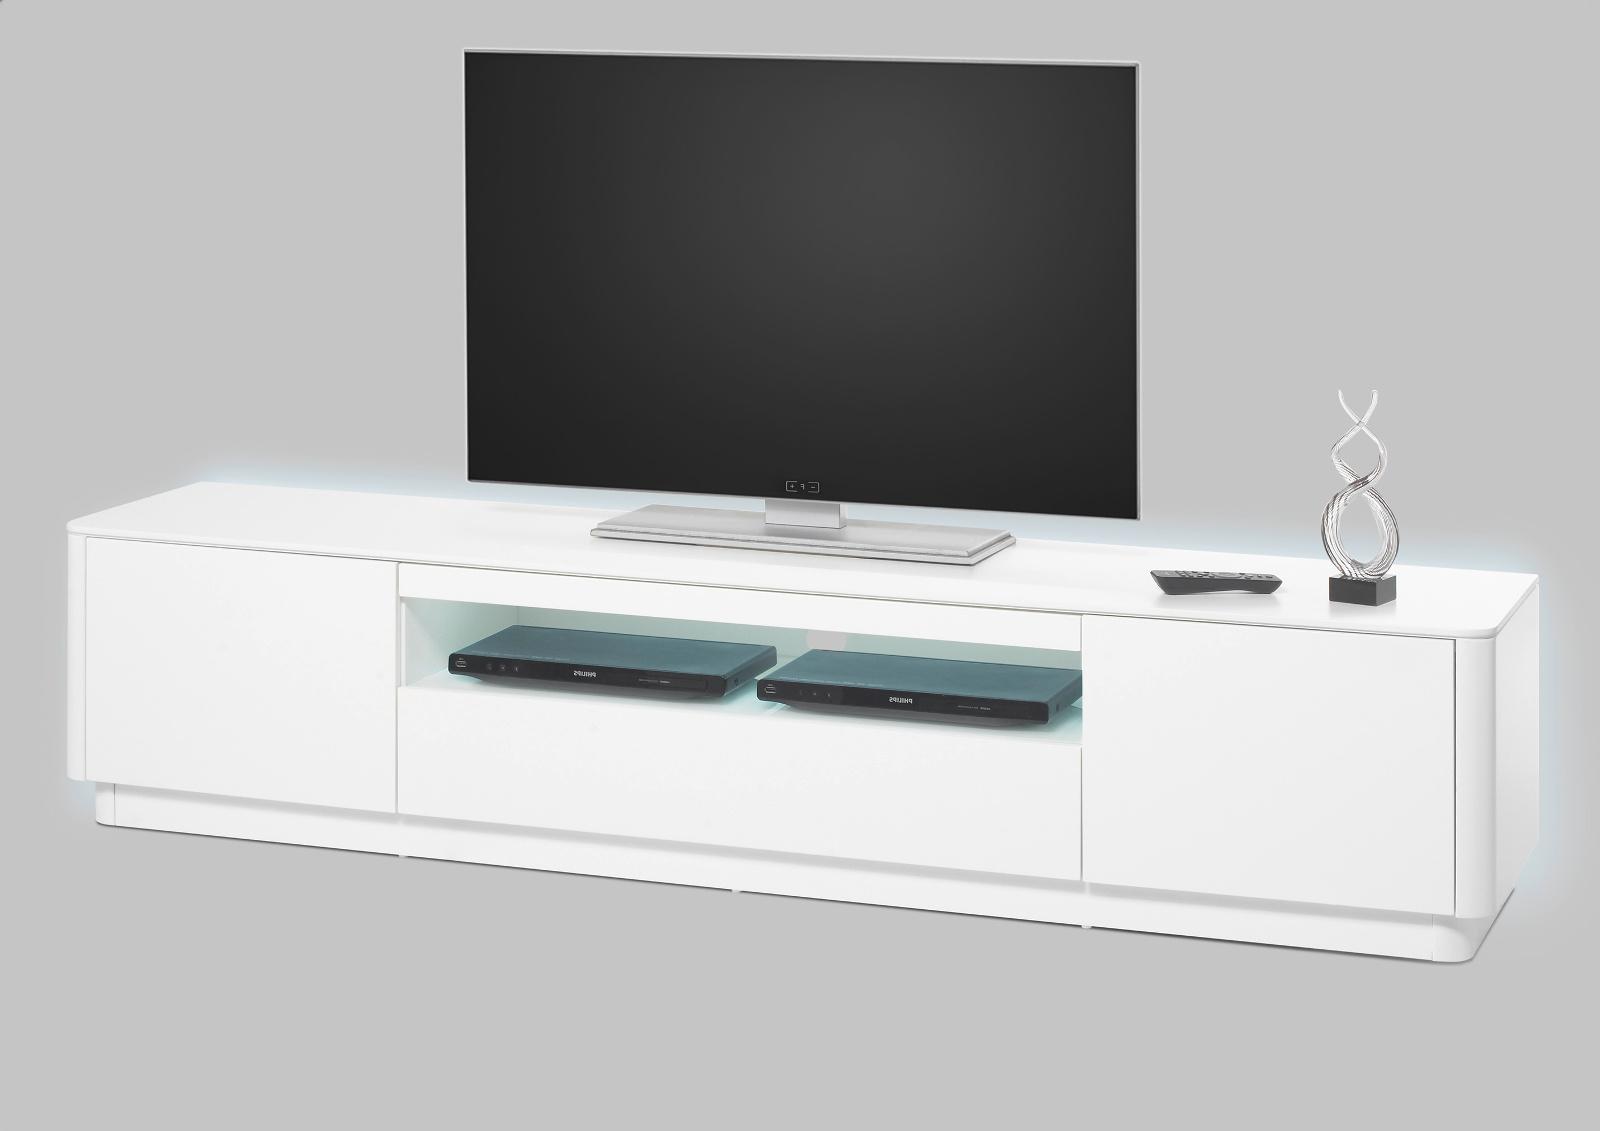 Lowboard Weiß 180 Cm : tv lowboard menton matt wei lack 180 cm ~ Yuntae.com Dekorationen Ideen